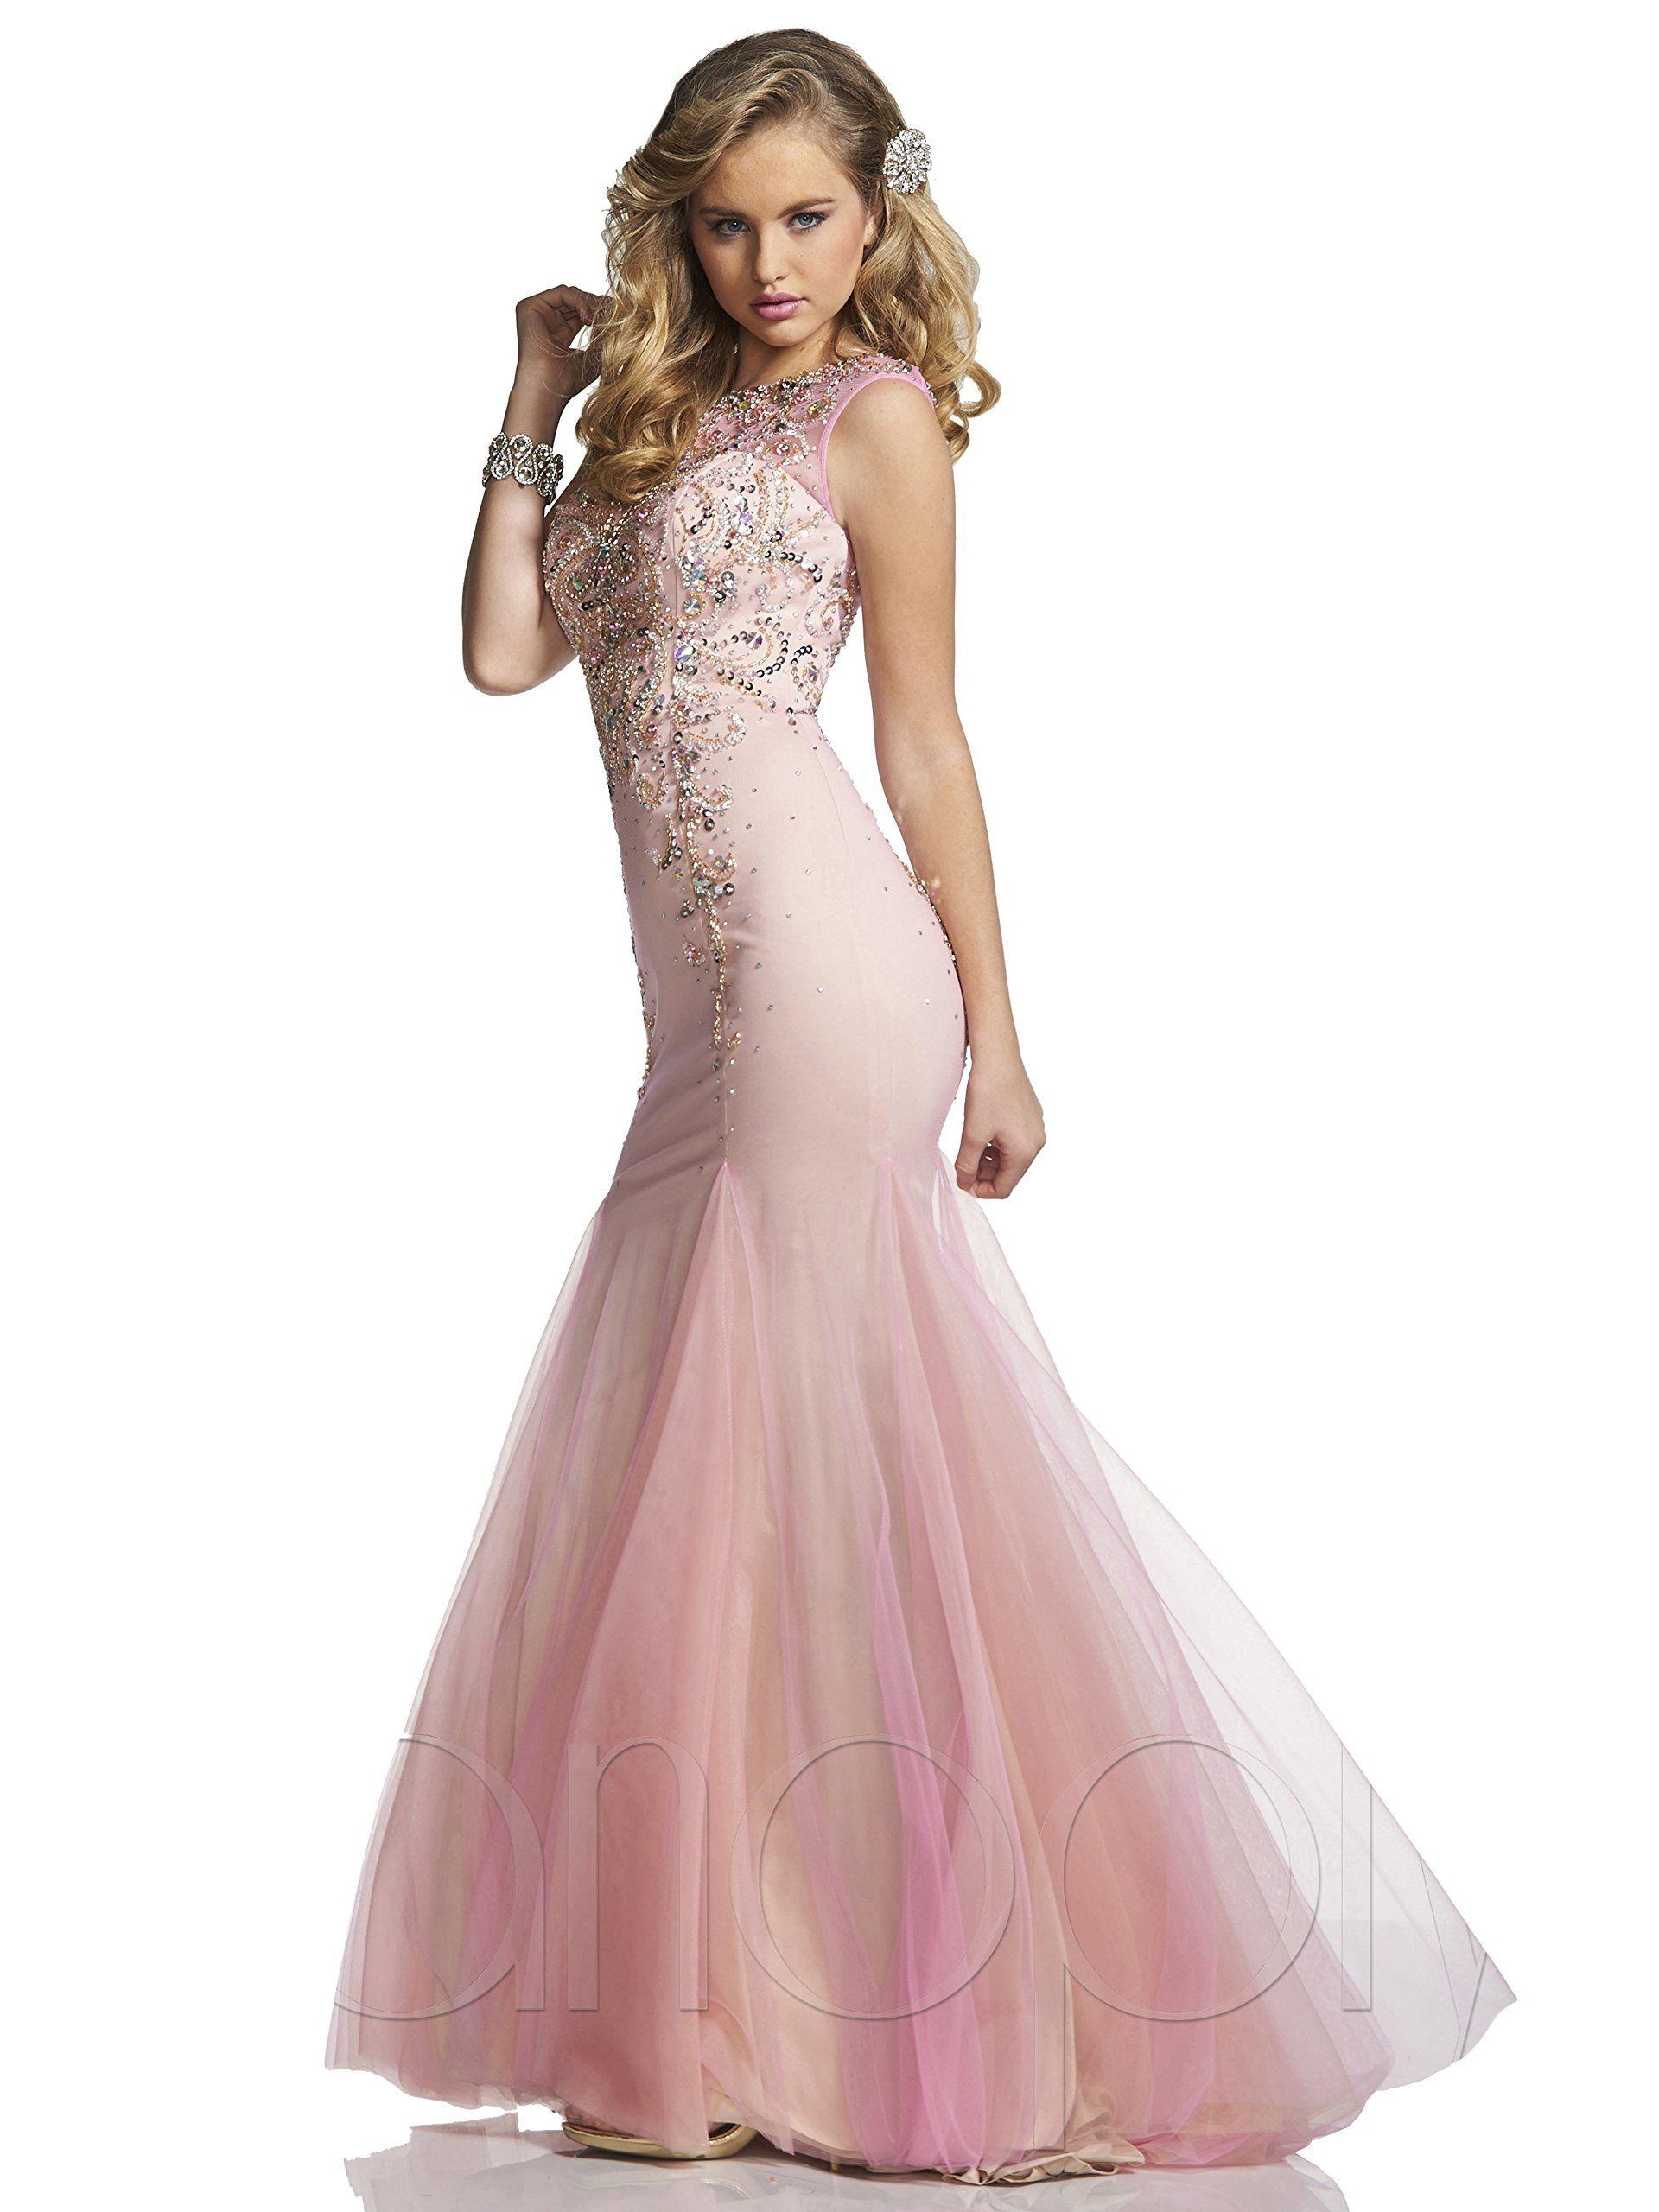 Panoply beaded sheer mermaid prom dress pinknude